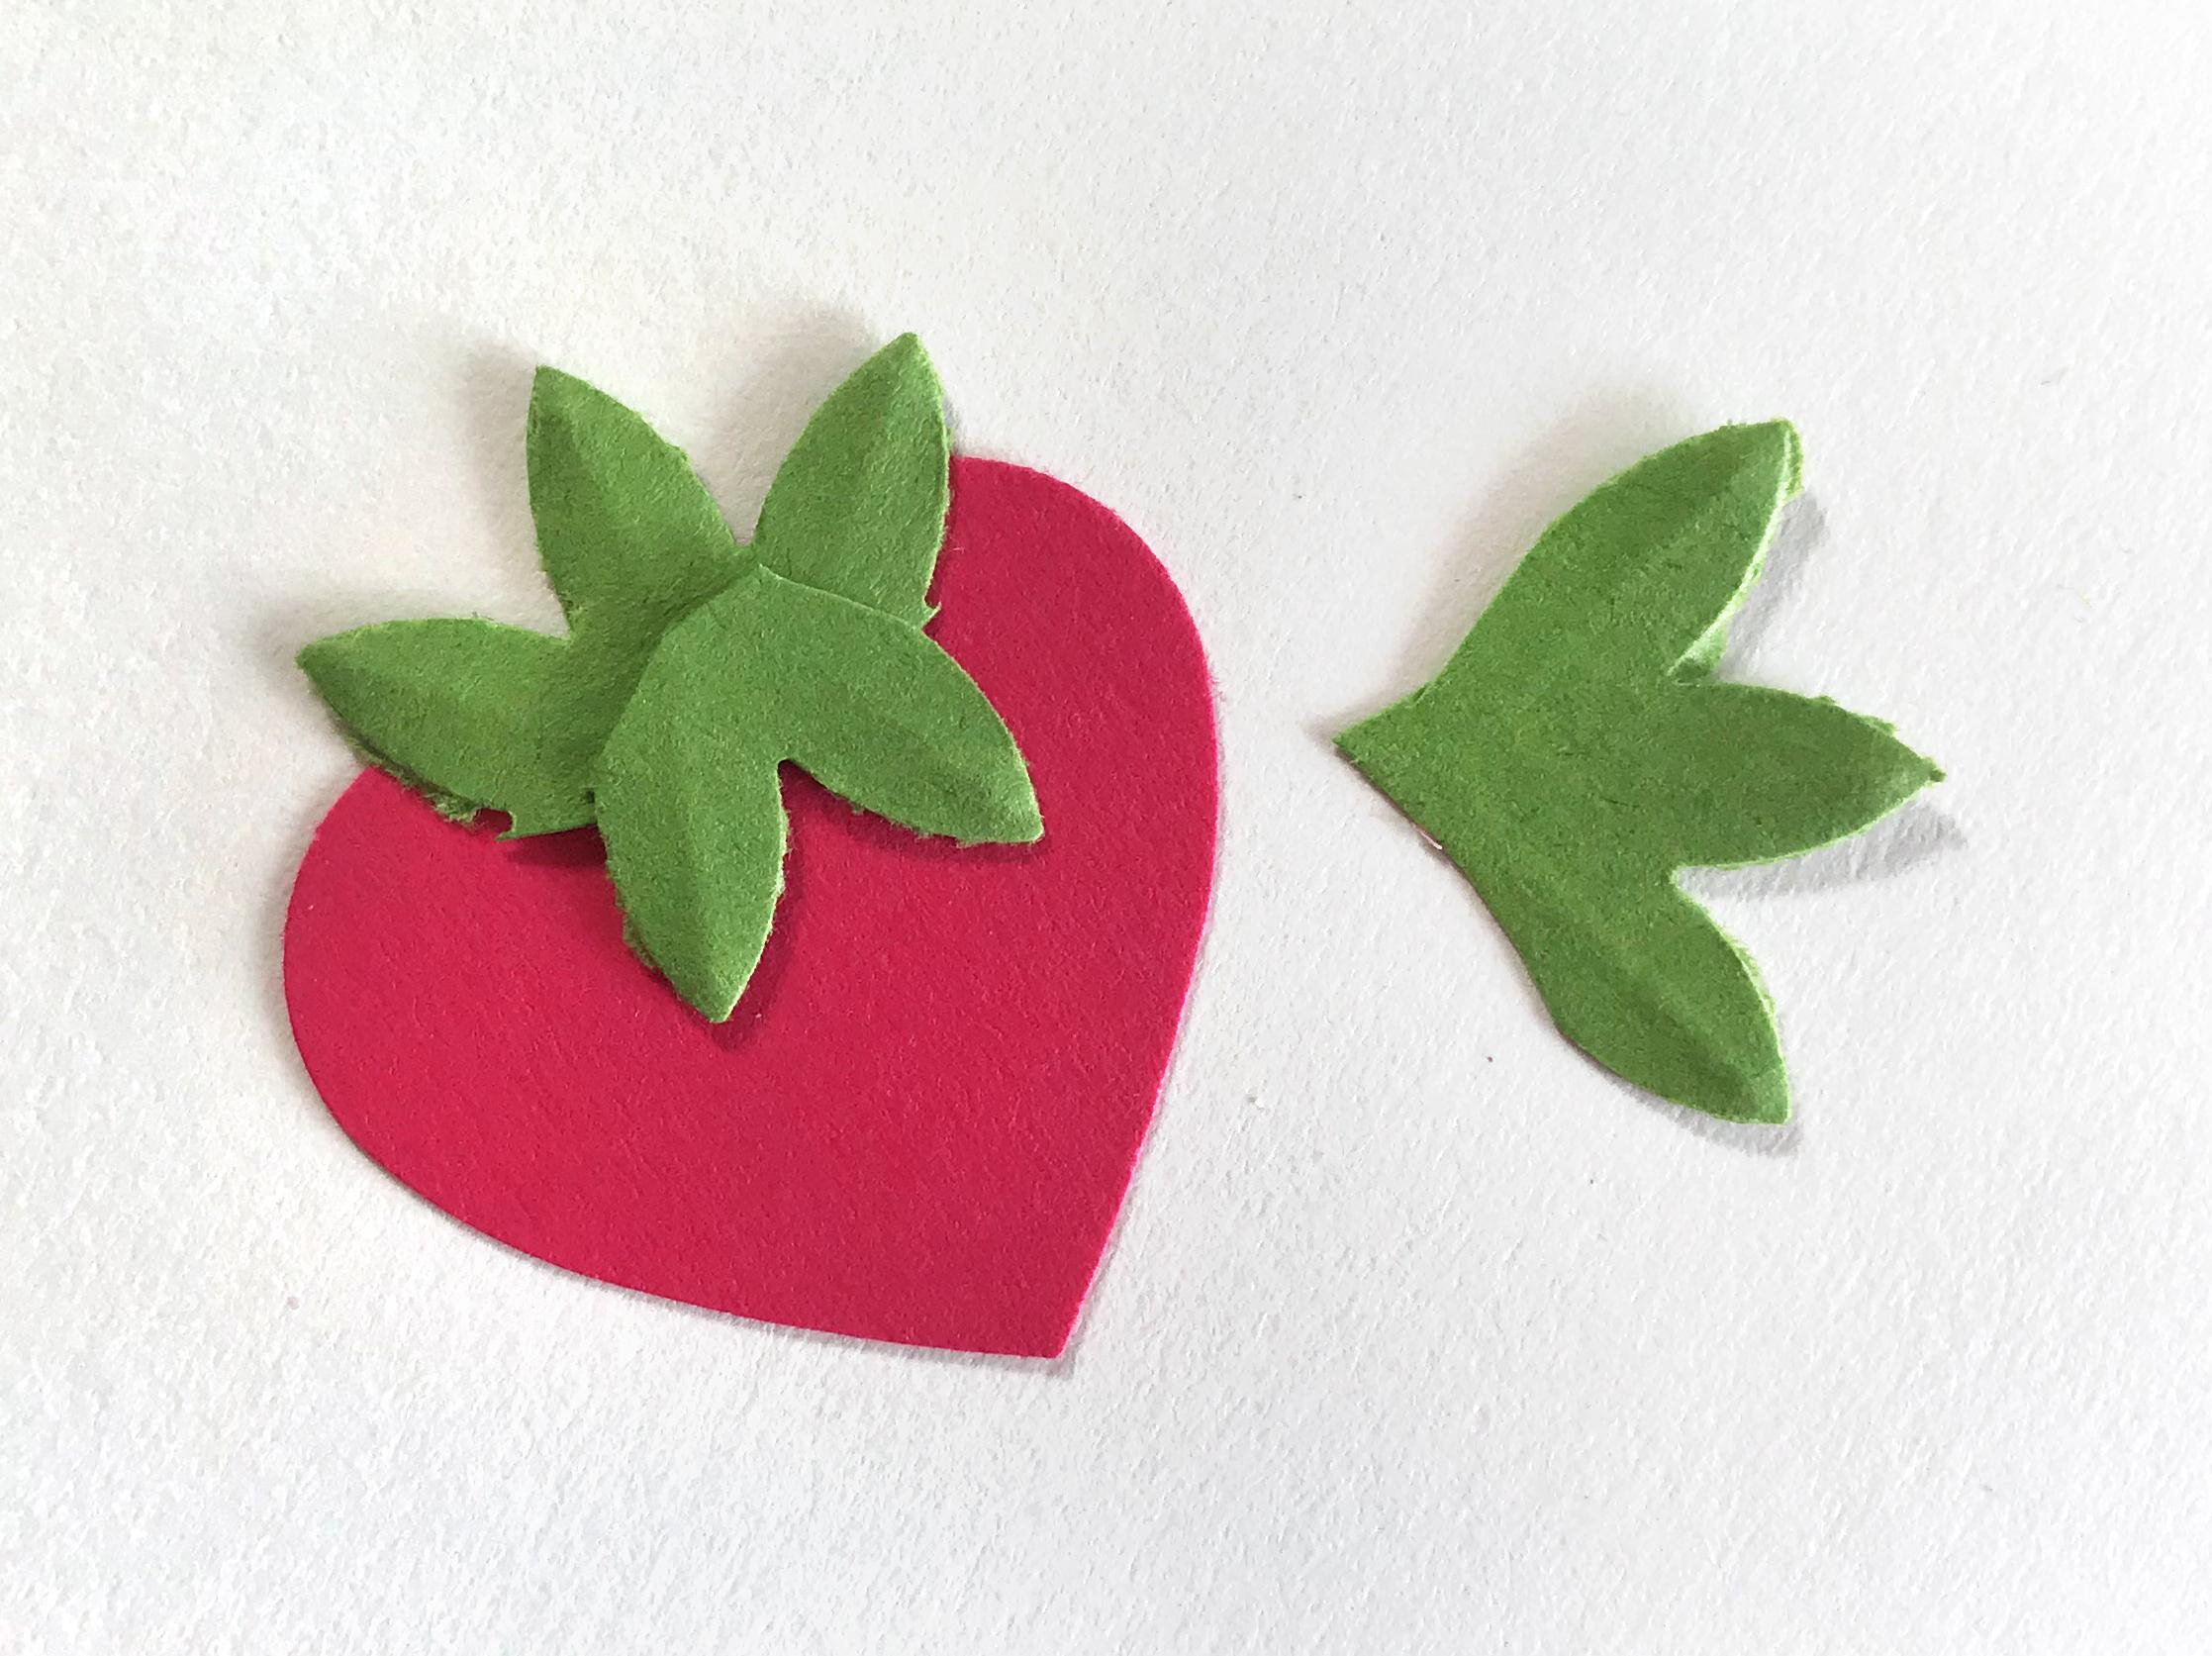 Locally-Grown-Strawberry-Scrapbook-Layout-Process5-Creative-Memories